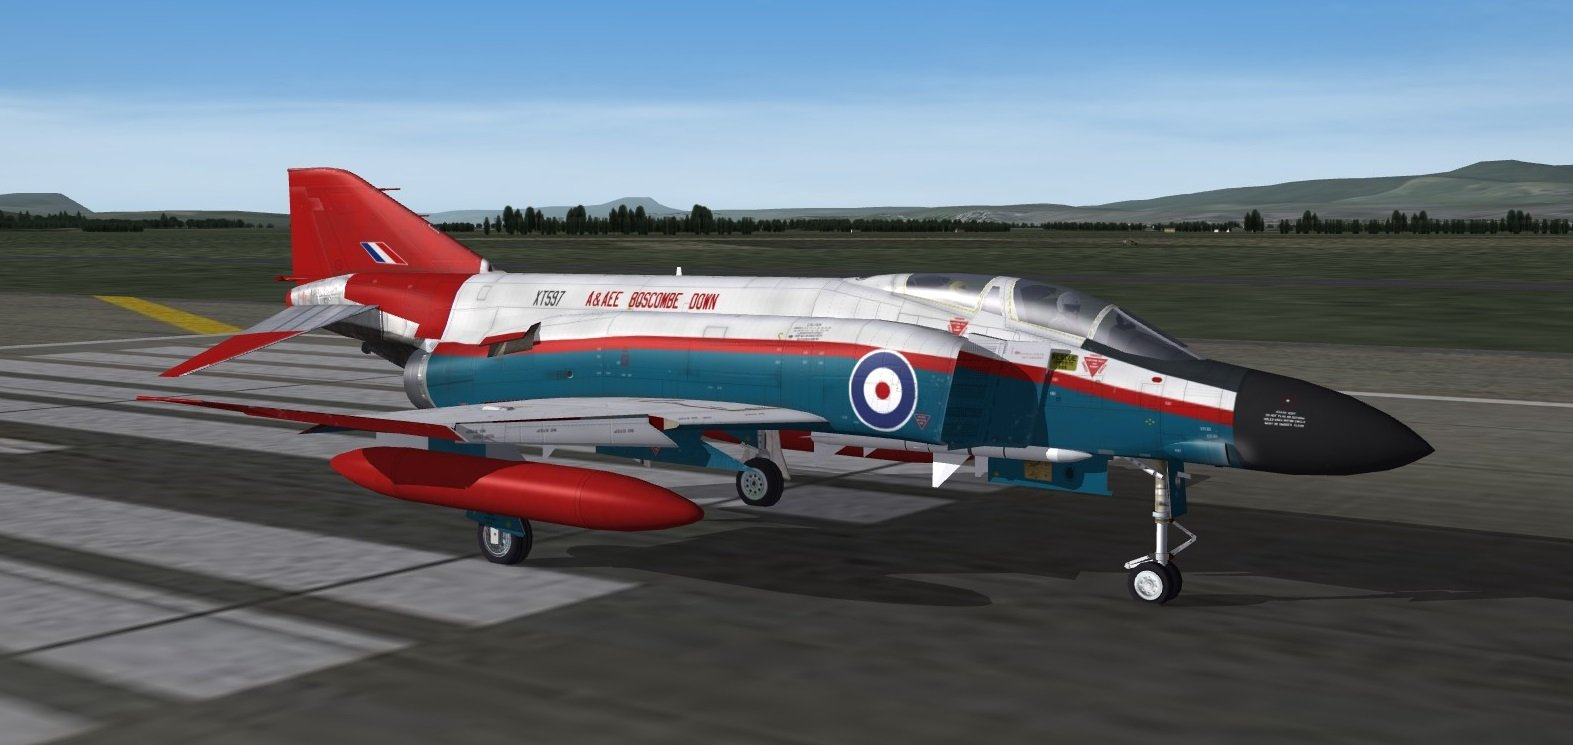 Phantom FG1 XT597 A Sqn, A&AEE Boscombe Down on TW F4K Model